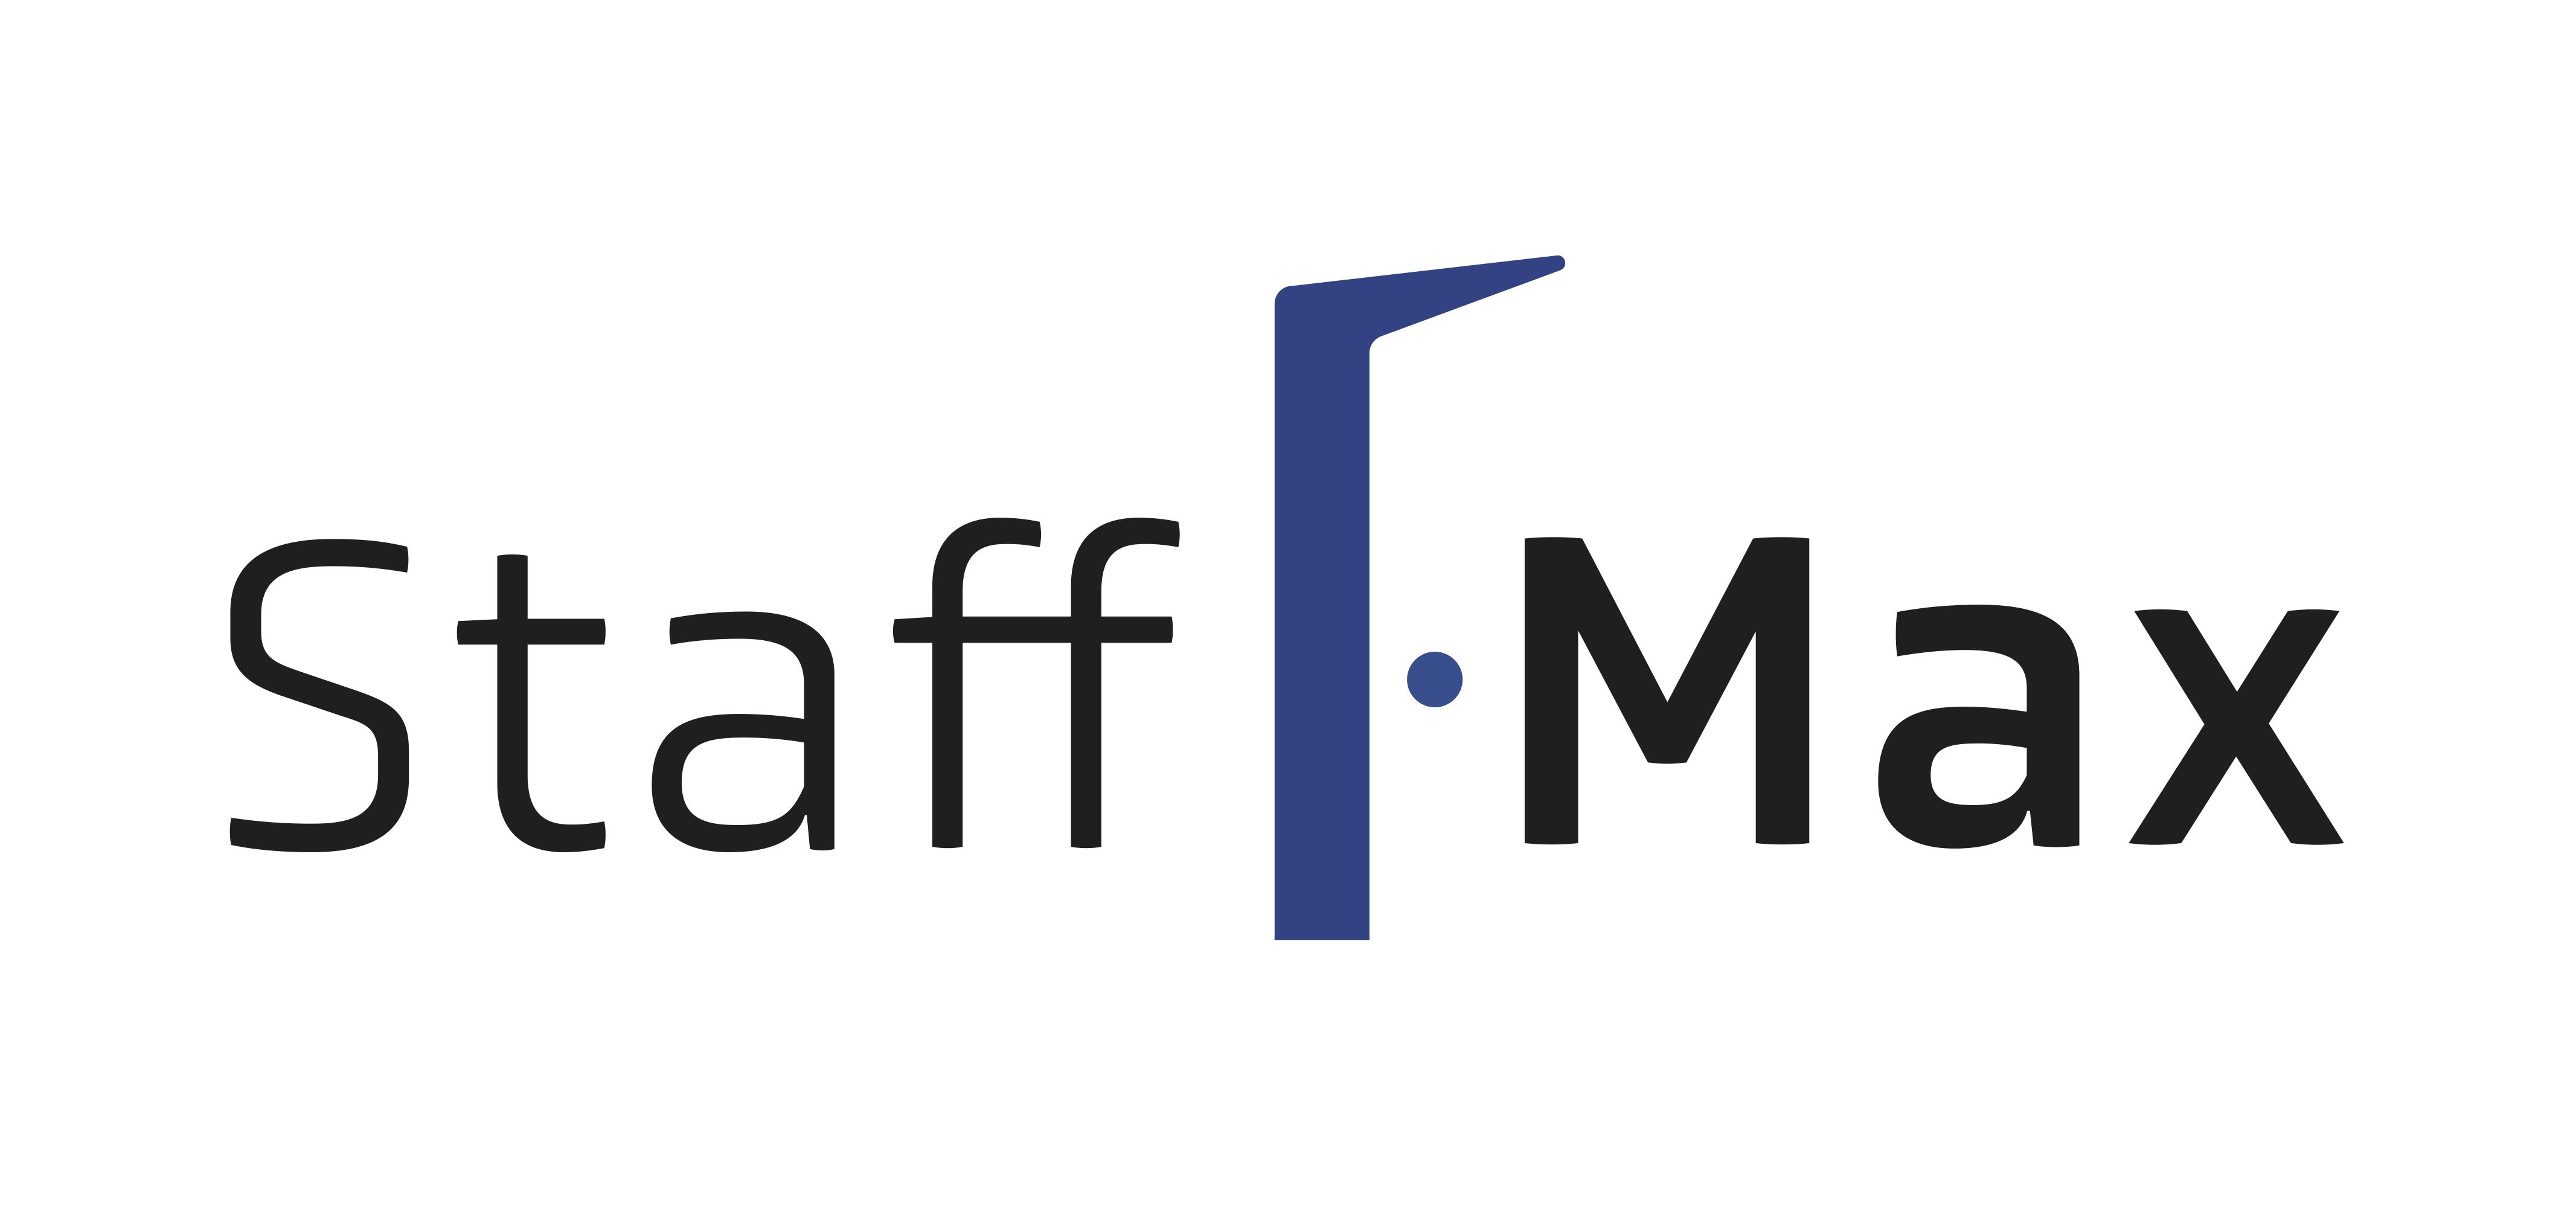 Staffmax logo